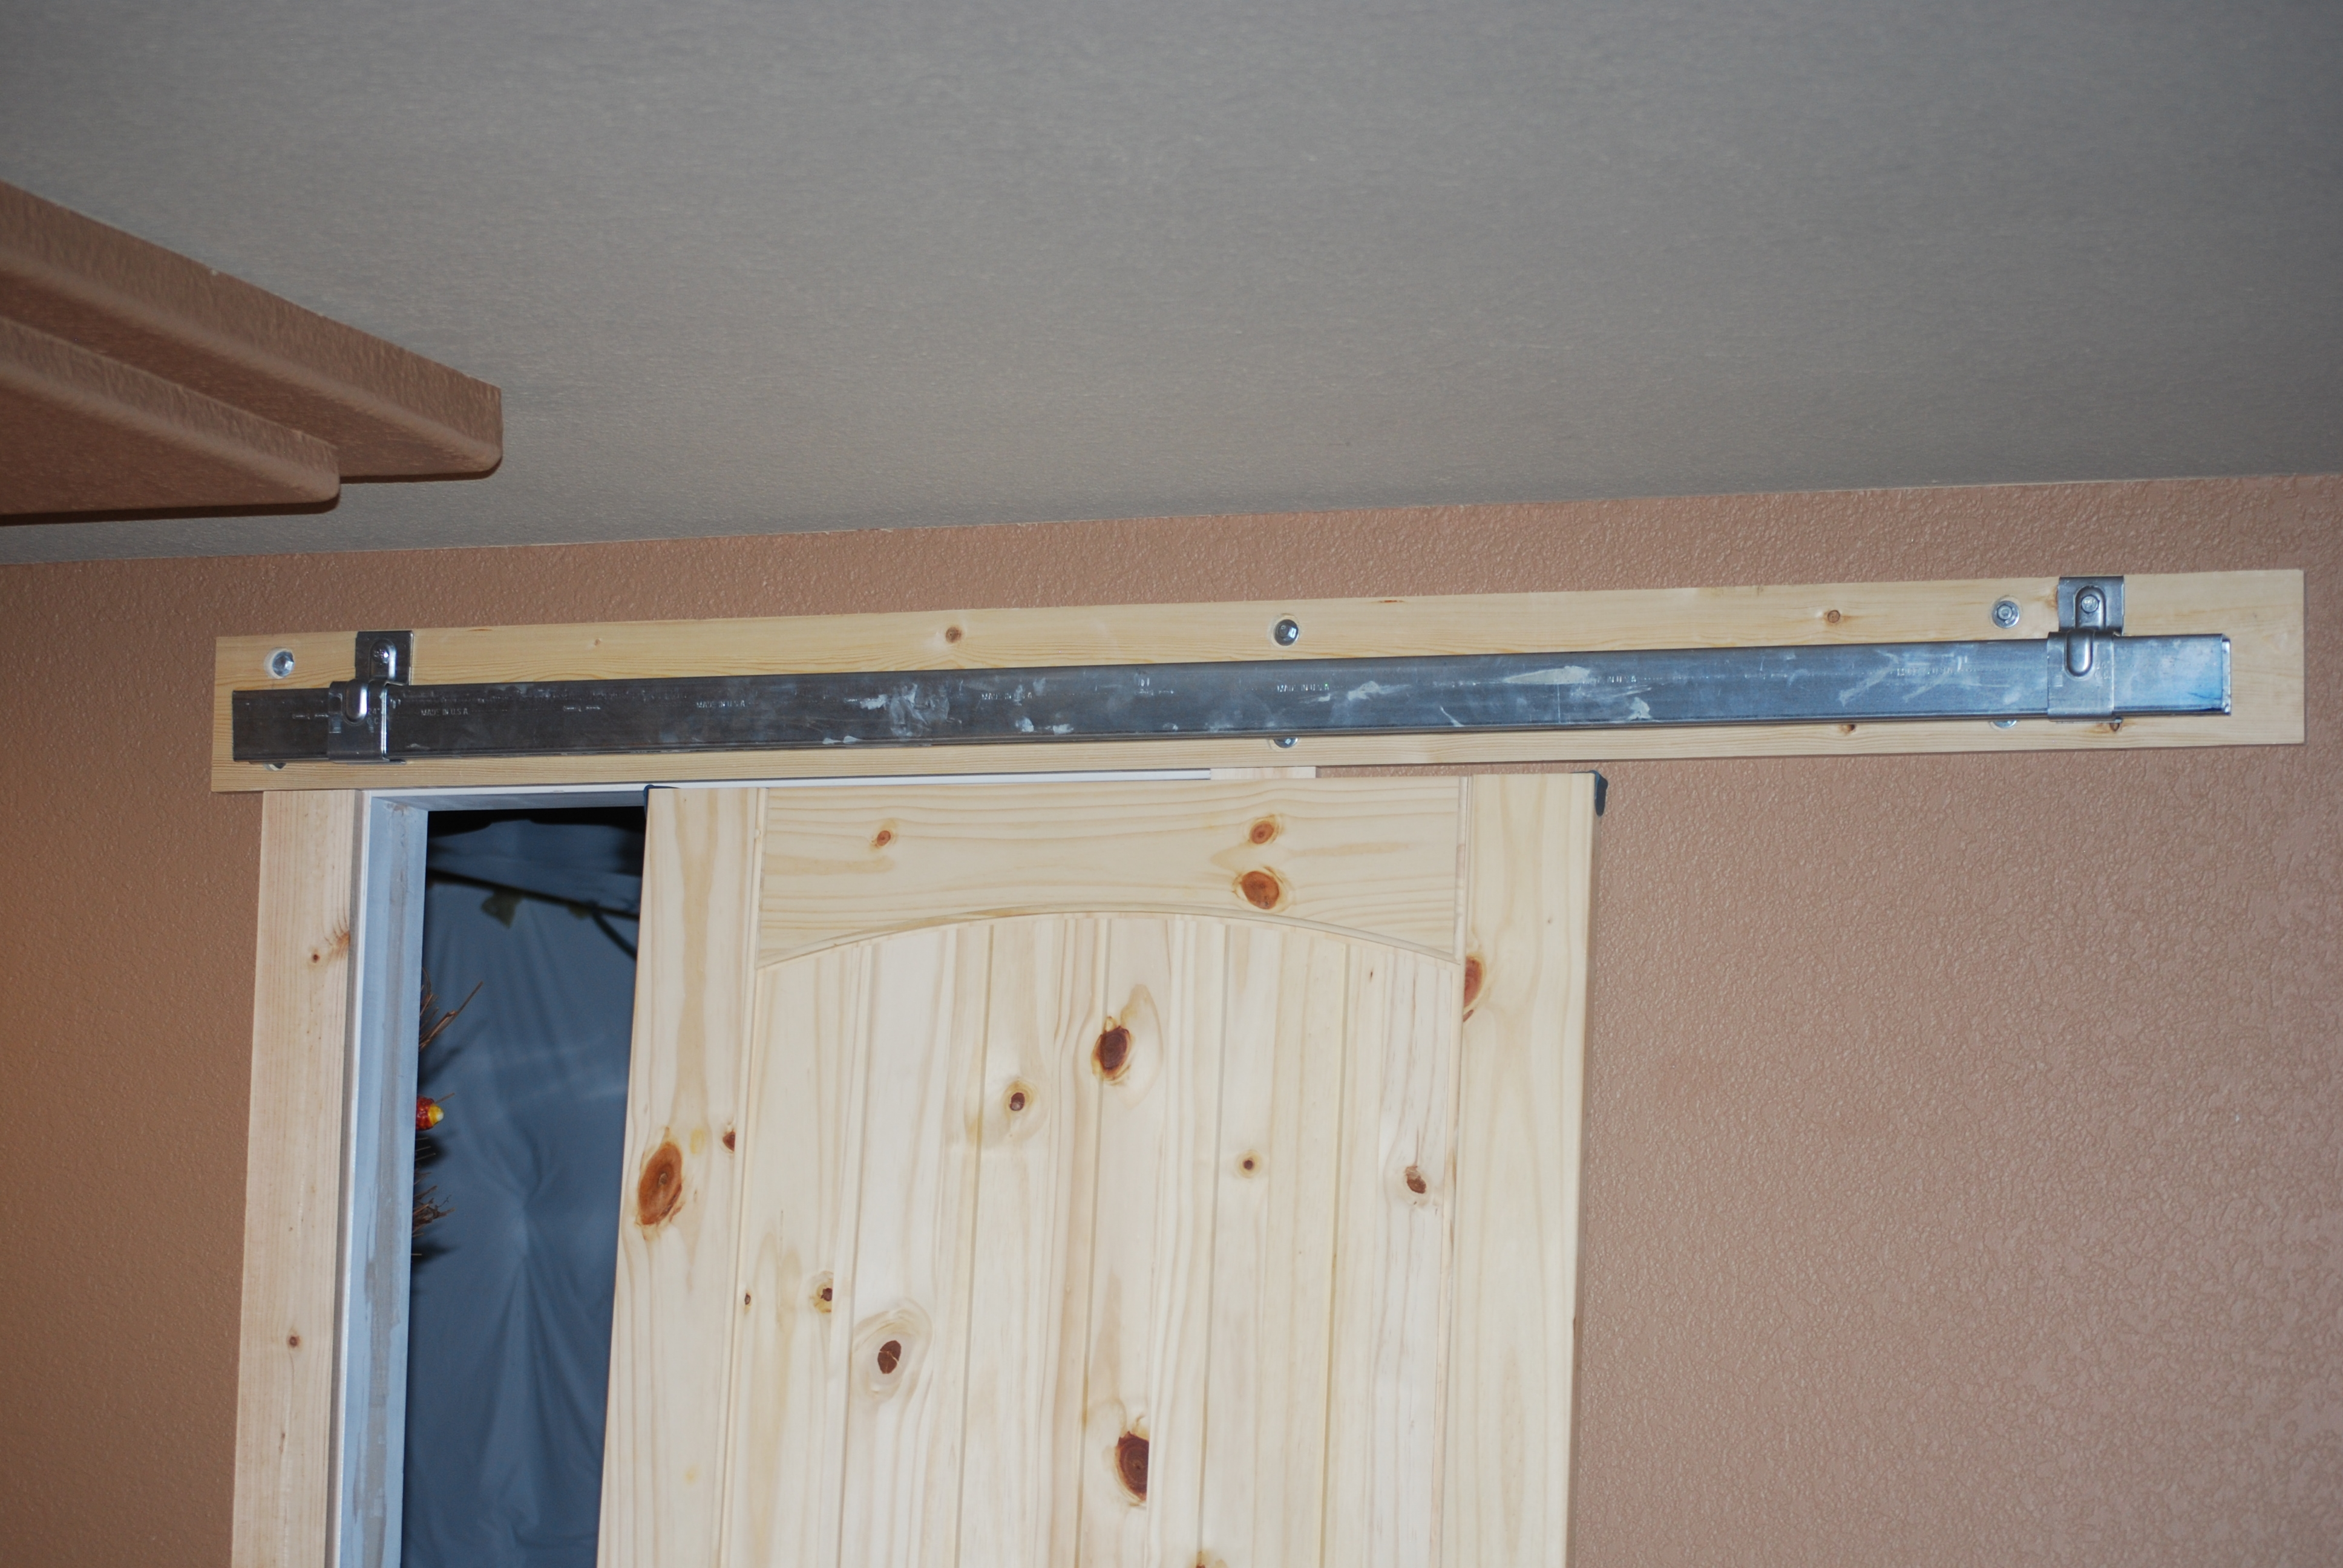 Wall Mounted Sliding Door KitWall Mounted Sliding Door Kit